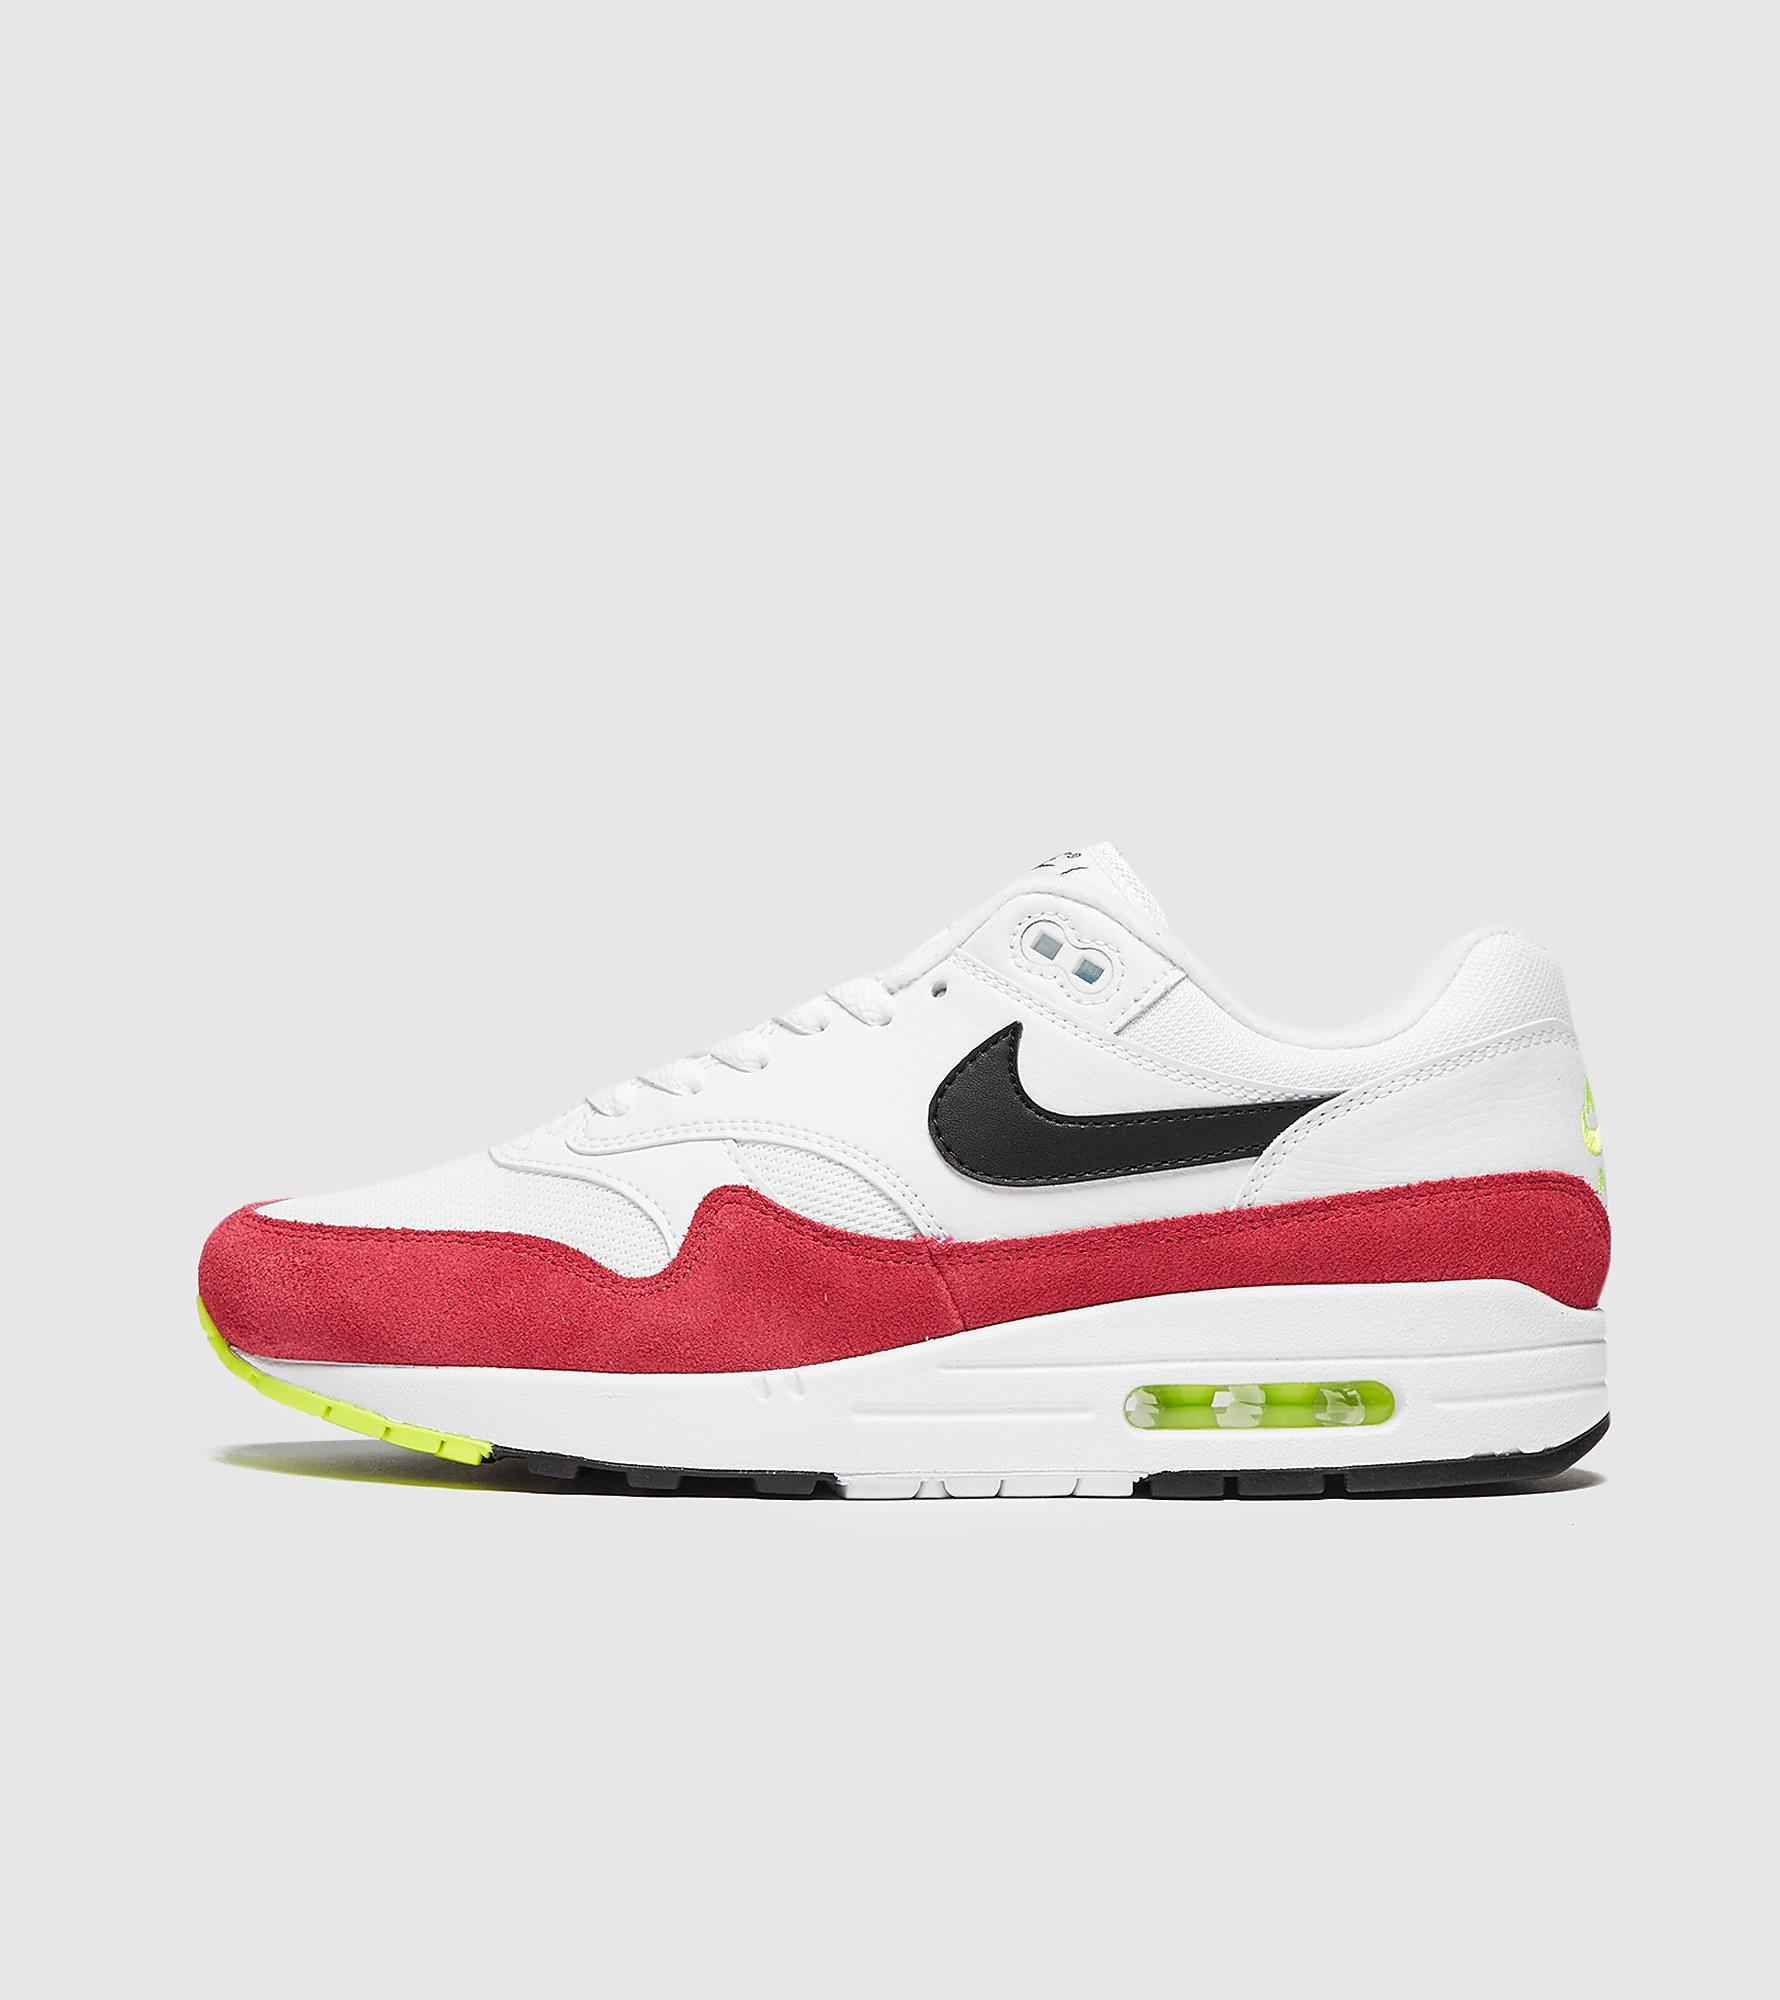 Nike Air Max 1 Essential White/Red